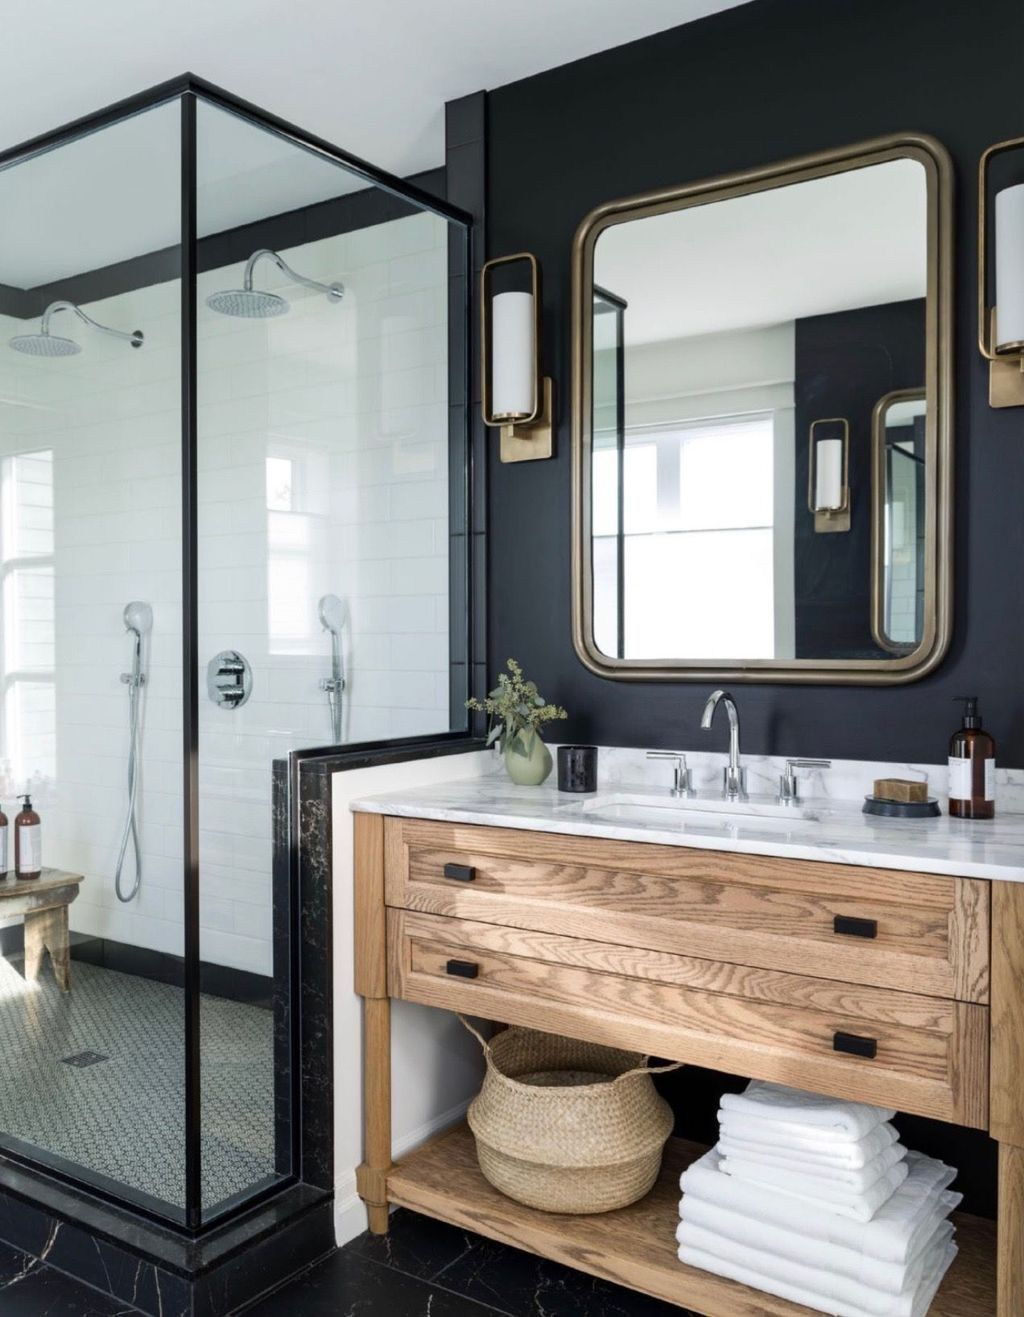 47 Favorite Modern Farmhouse Home Decor Ideas images